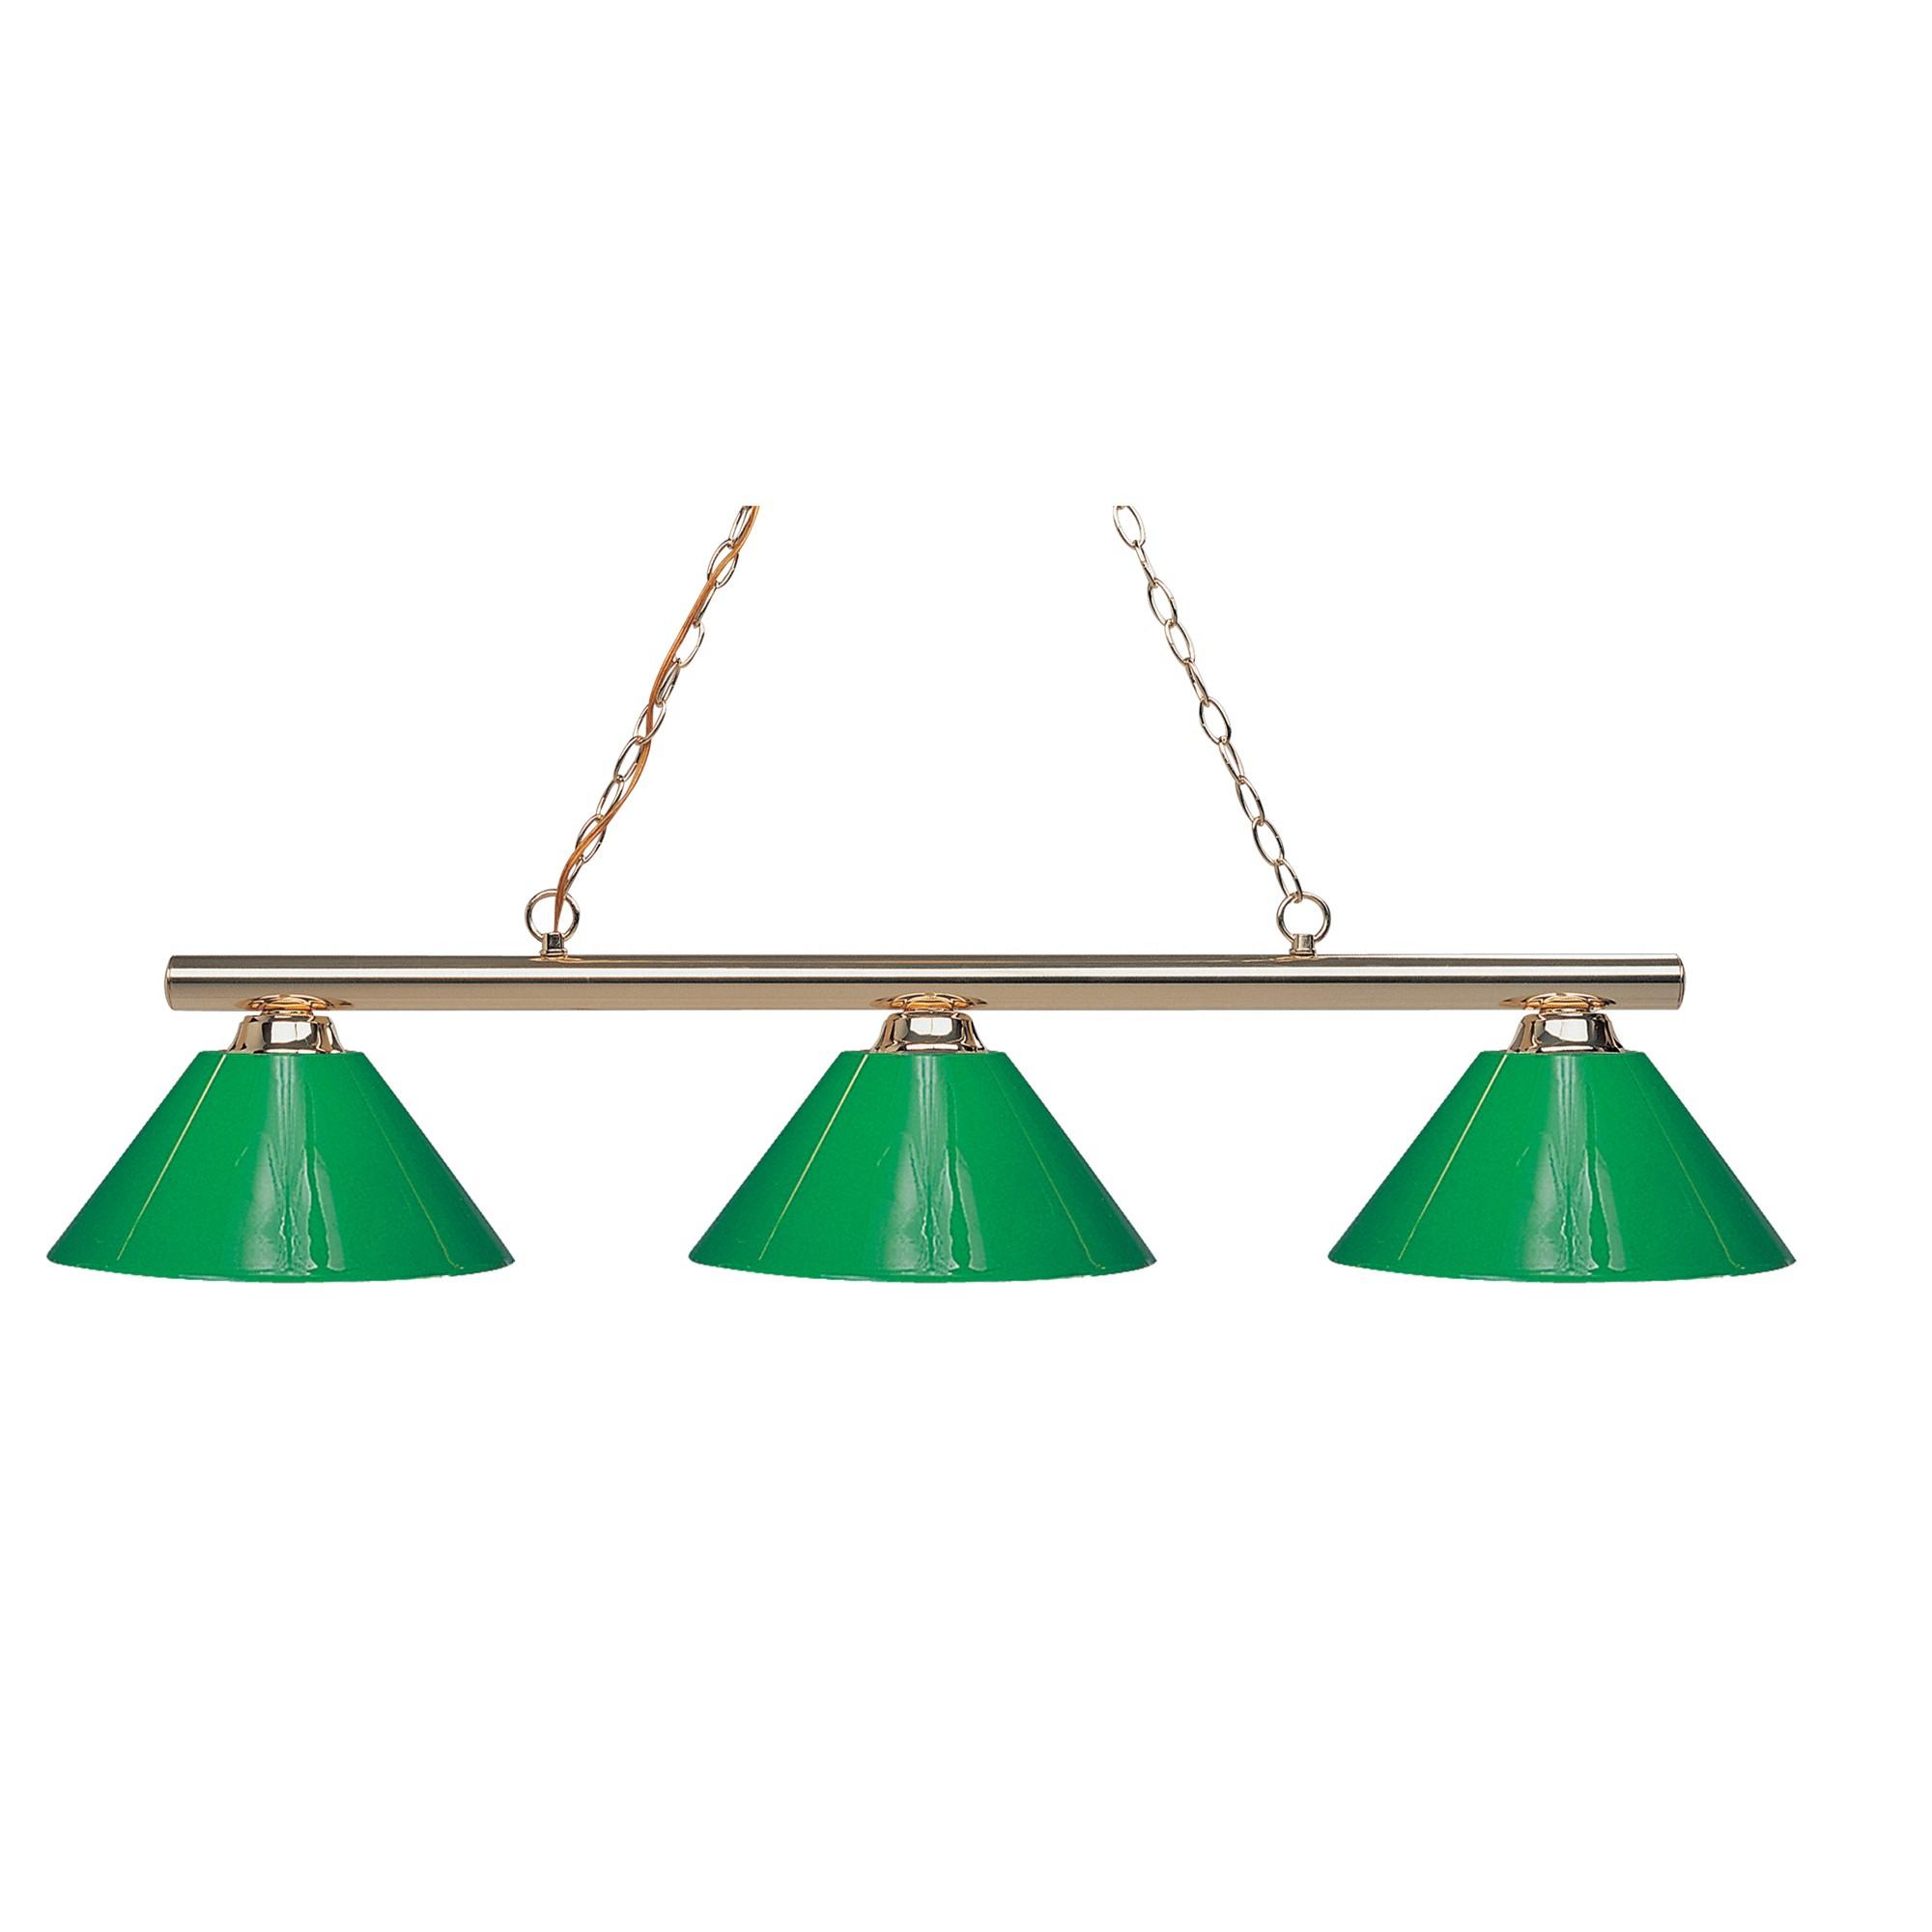 Billiard ceiling lights with green glass set of zlite